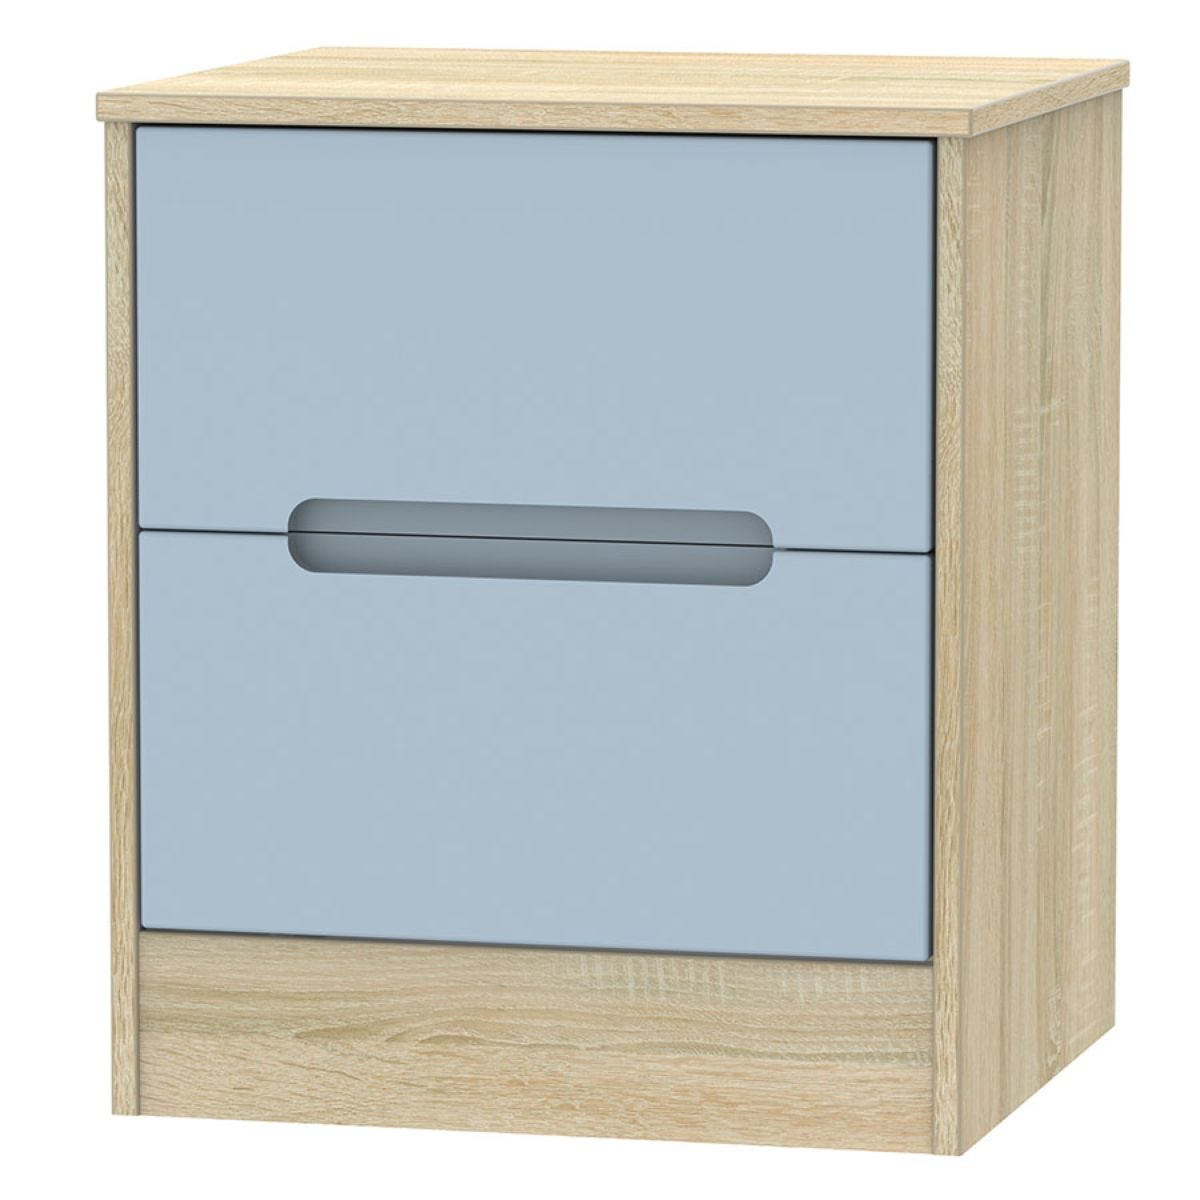 Barquero 2-Drawer Bedside Table - Pine/Denim